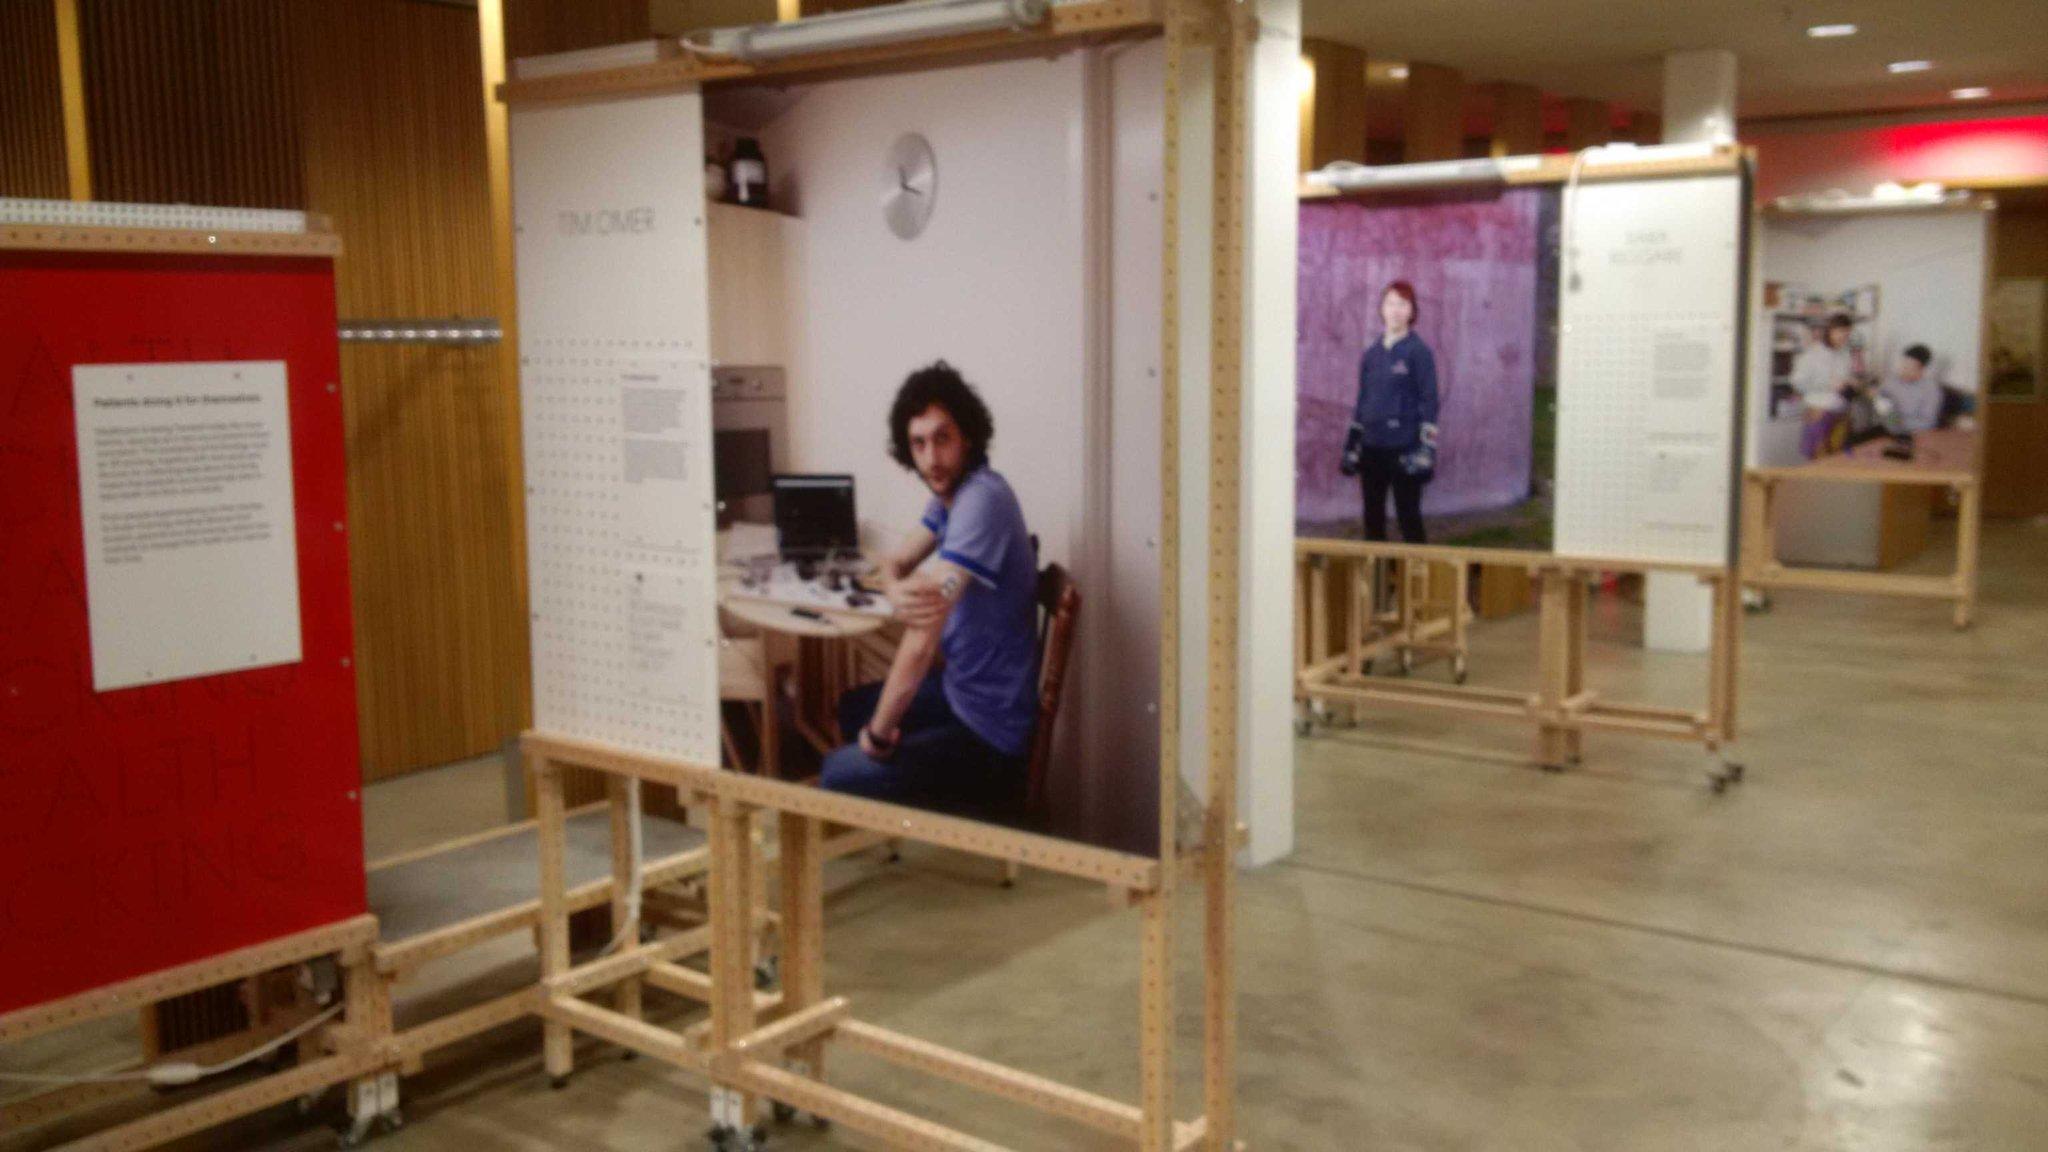 @sparks_eu The exhibition is taking shape https://t.co/QeK14wXgNm